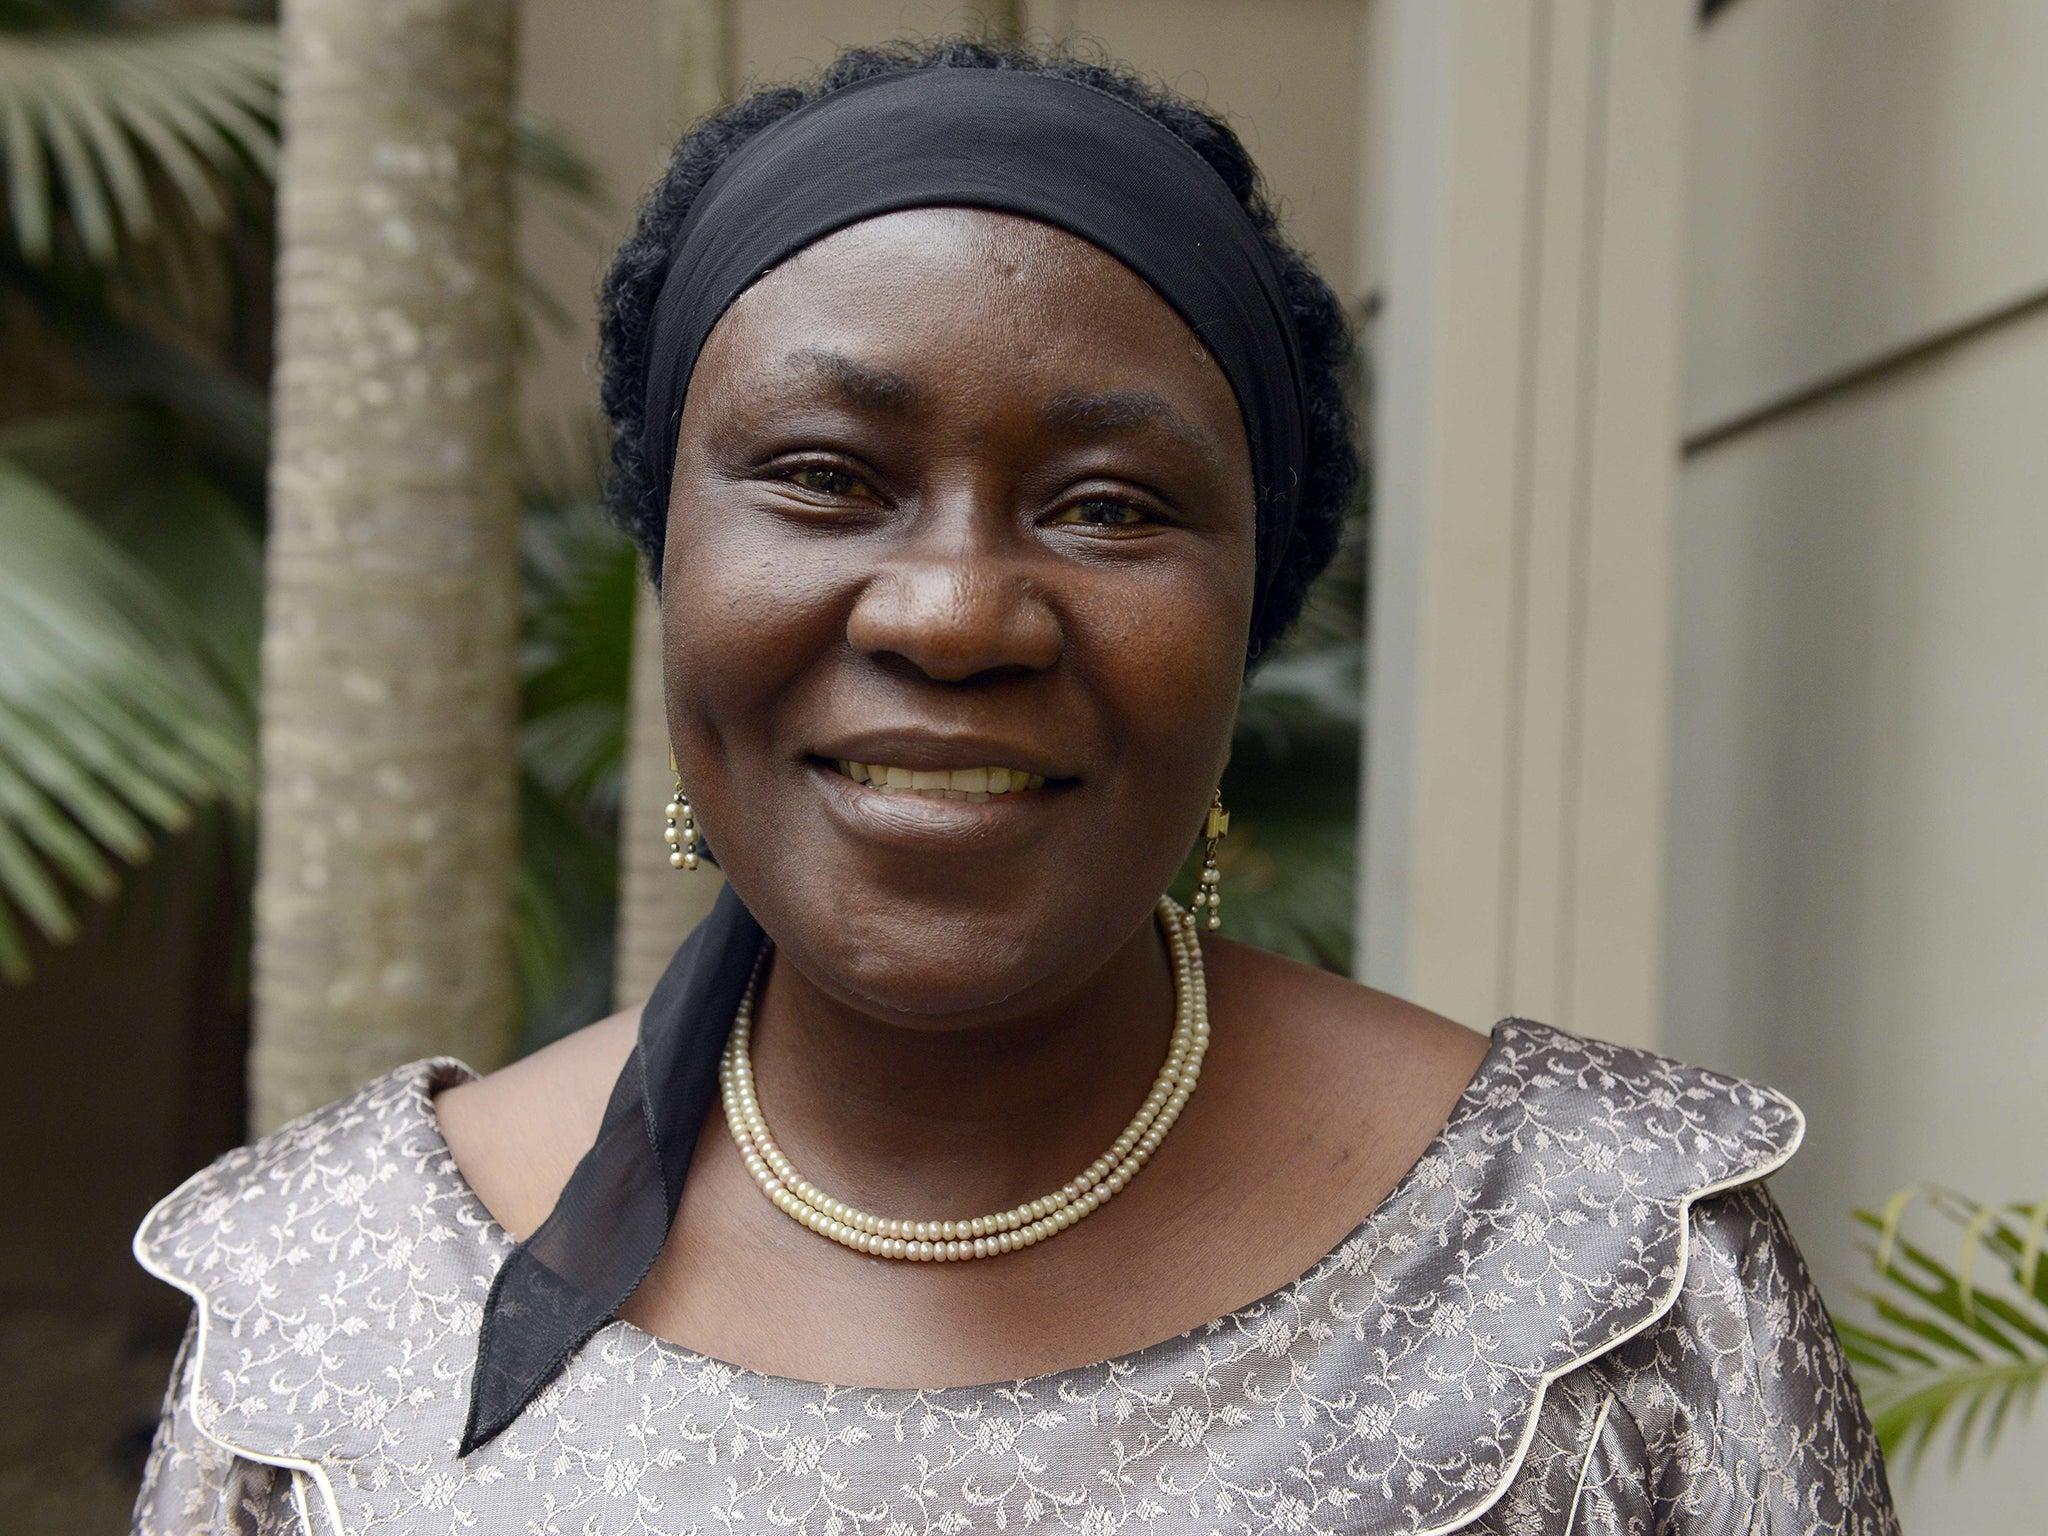 Sugar Mummy in Nigeria - Get Paid up to 5 Million Naira